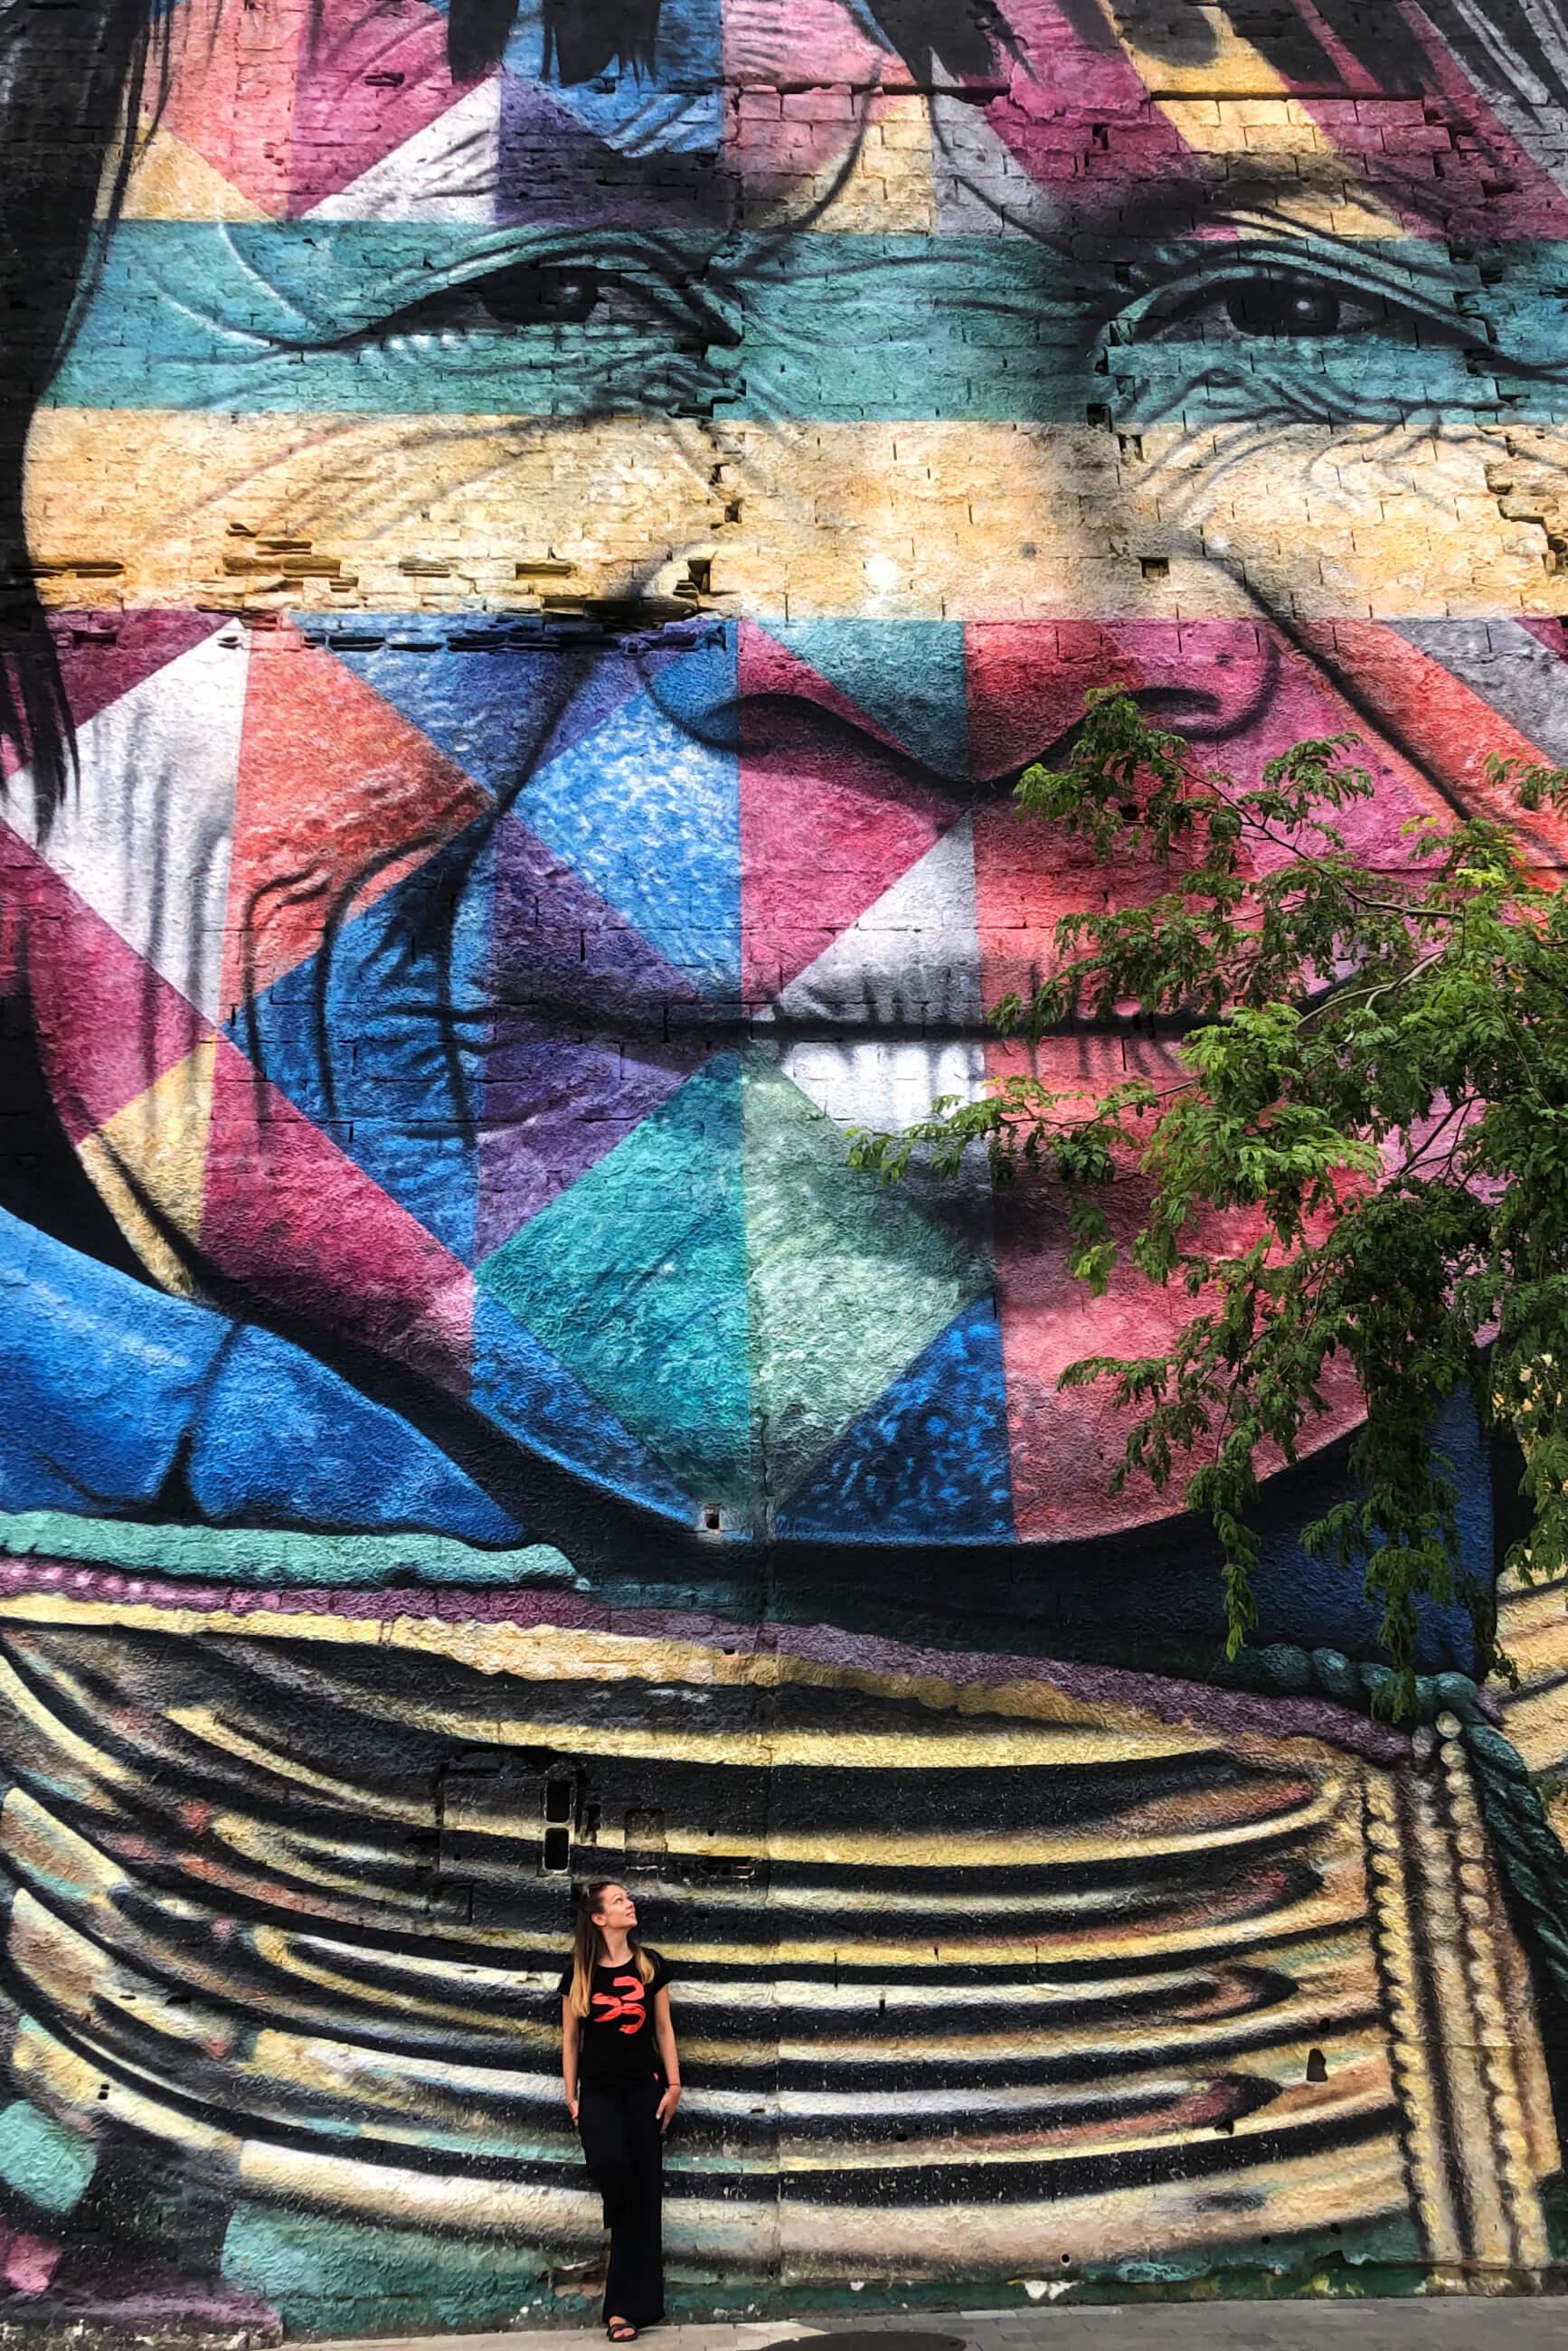 https://bubo.sk/uploads/galleries/5016/laura_rio_streetart.jpg